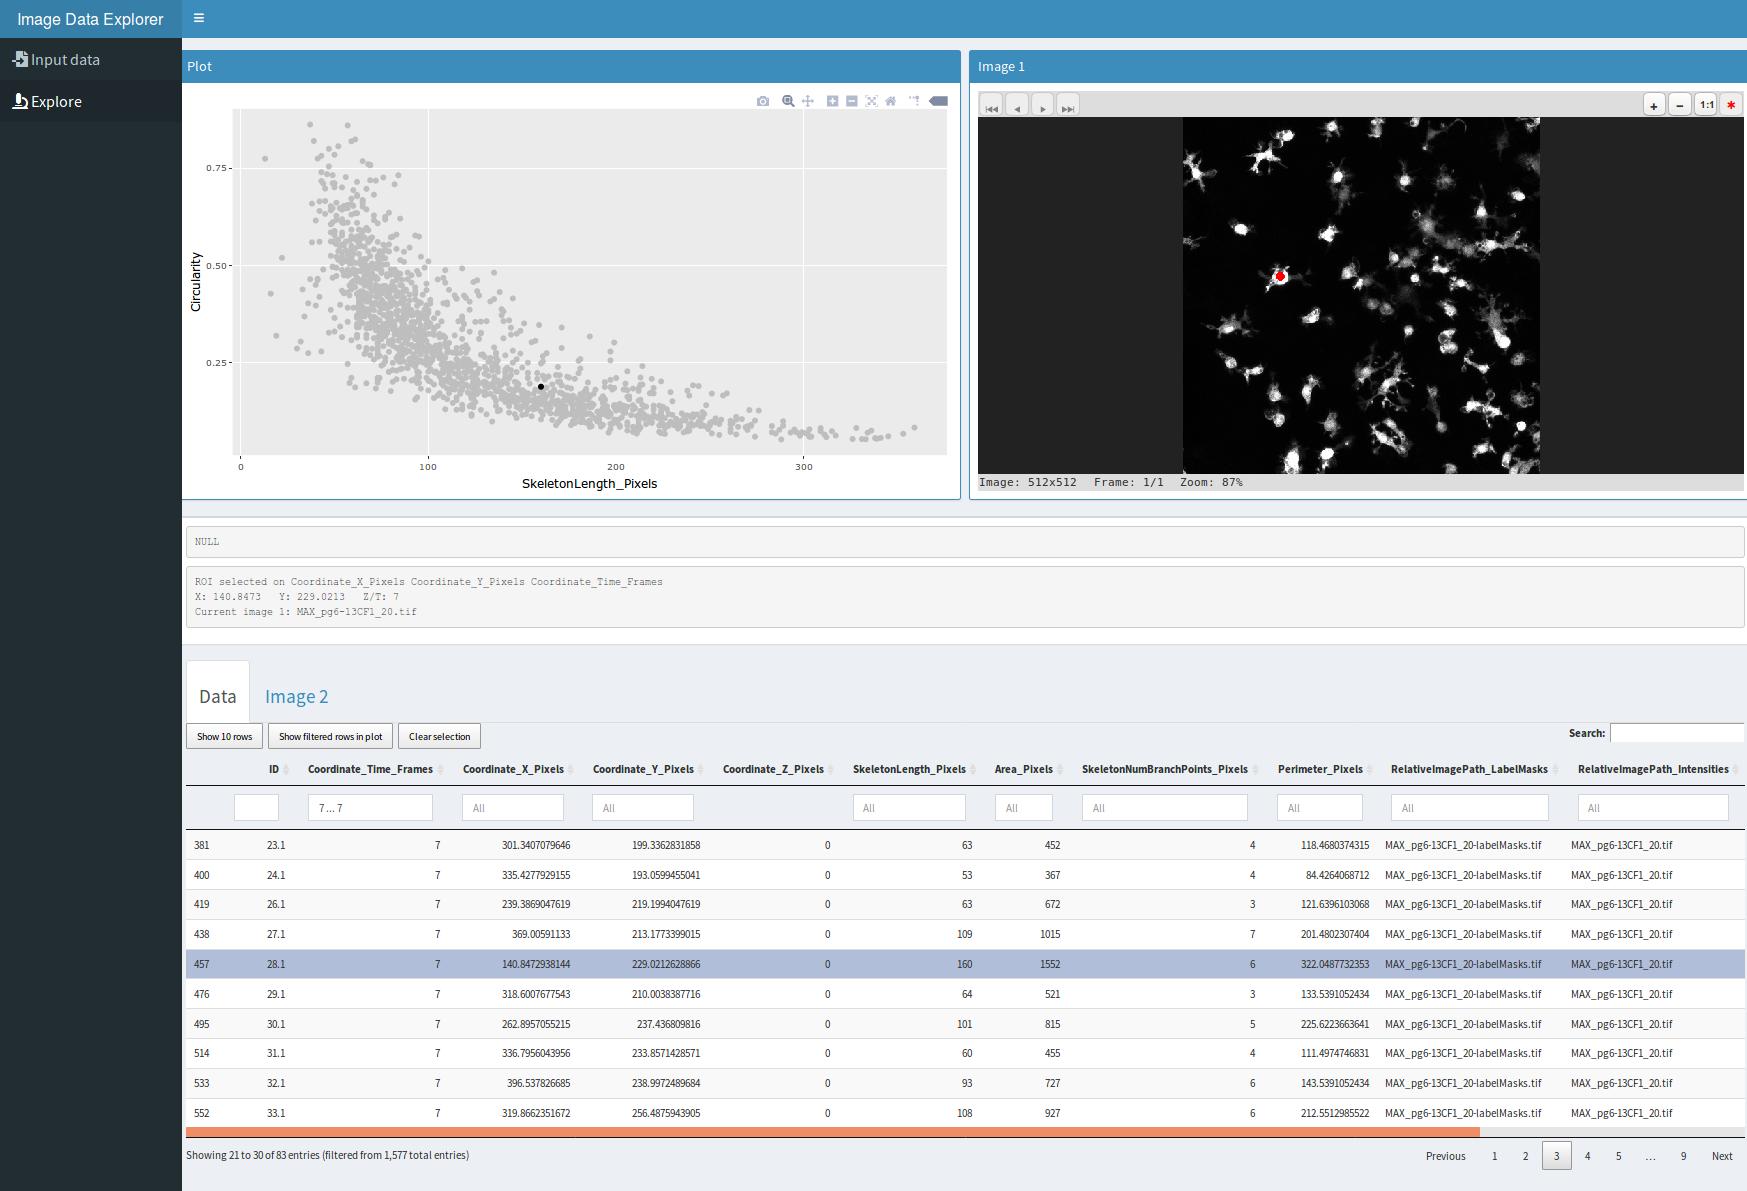 screenshots/image_data_explorer_v0.1.screenshot.png